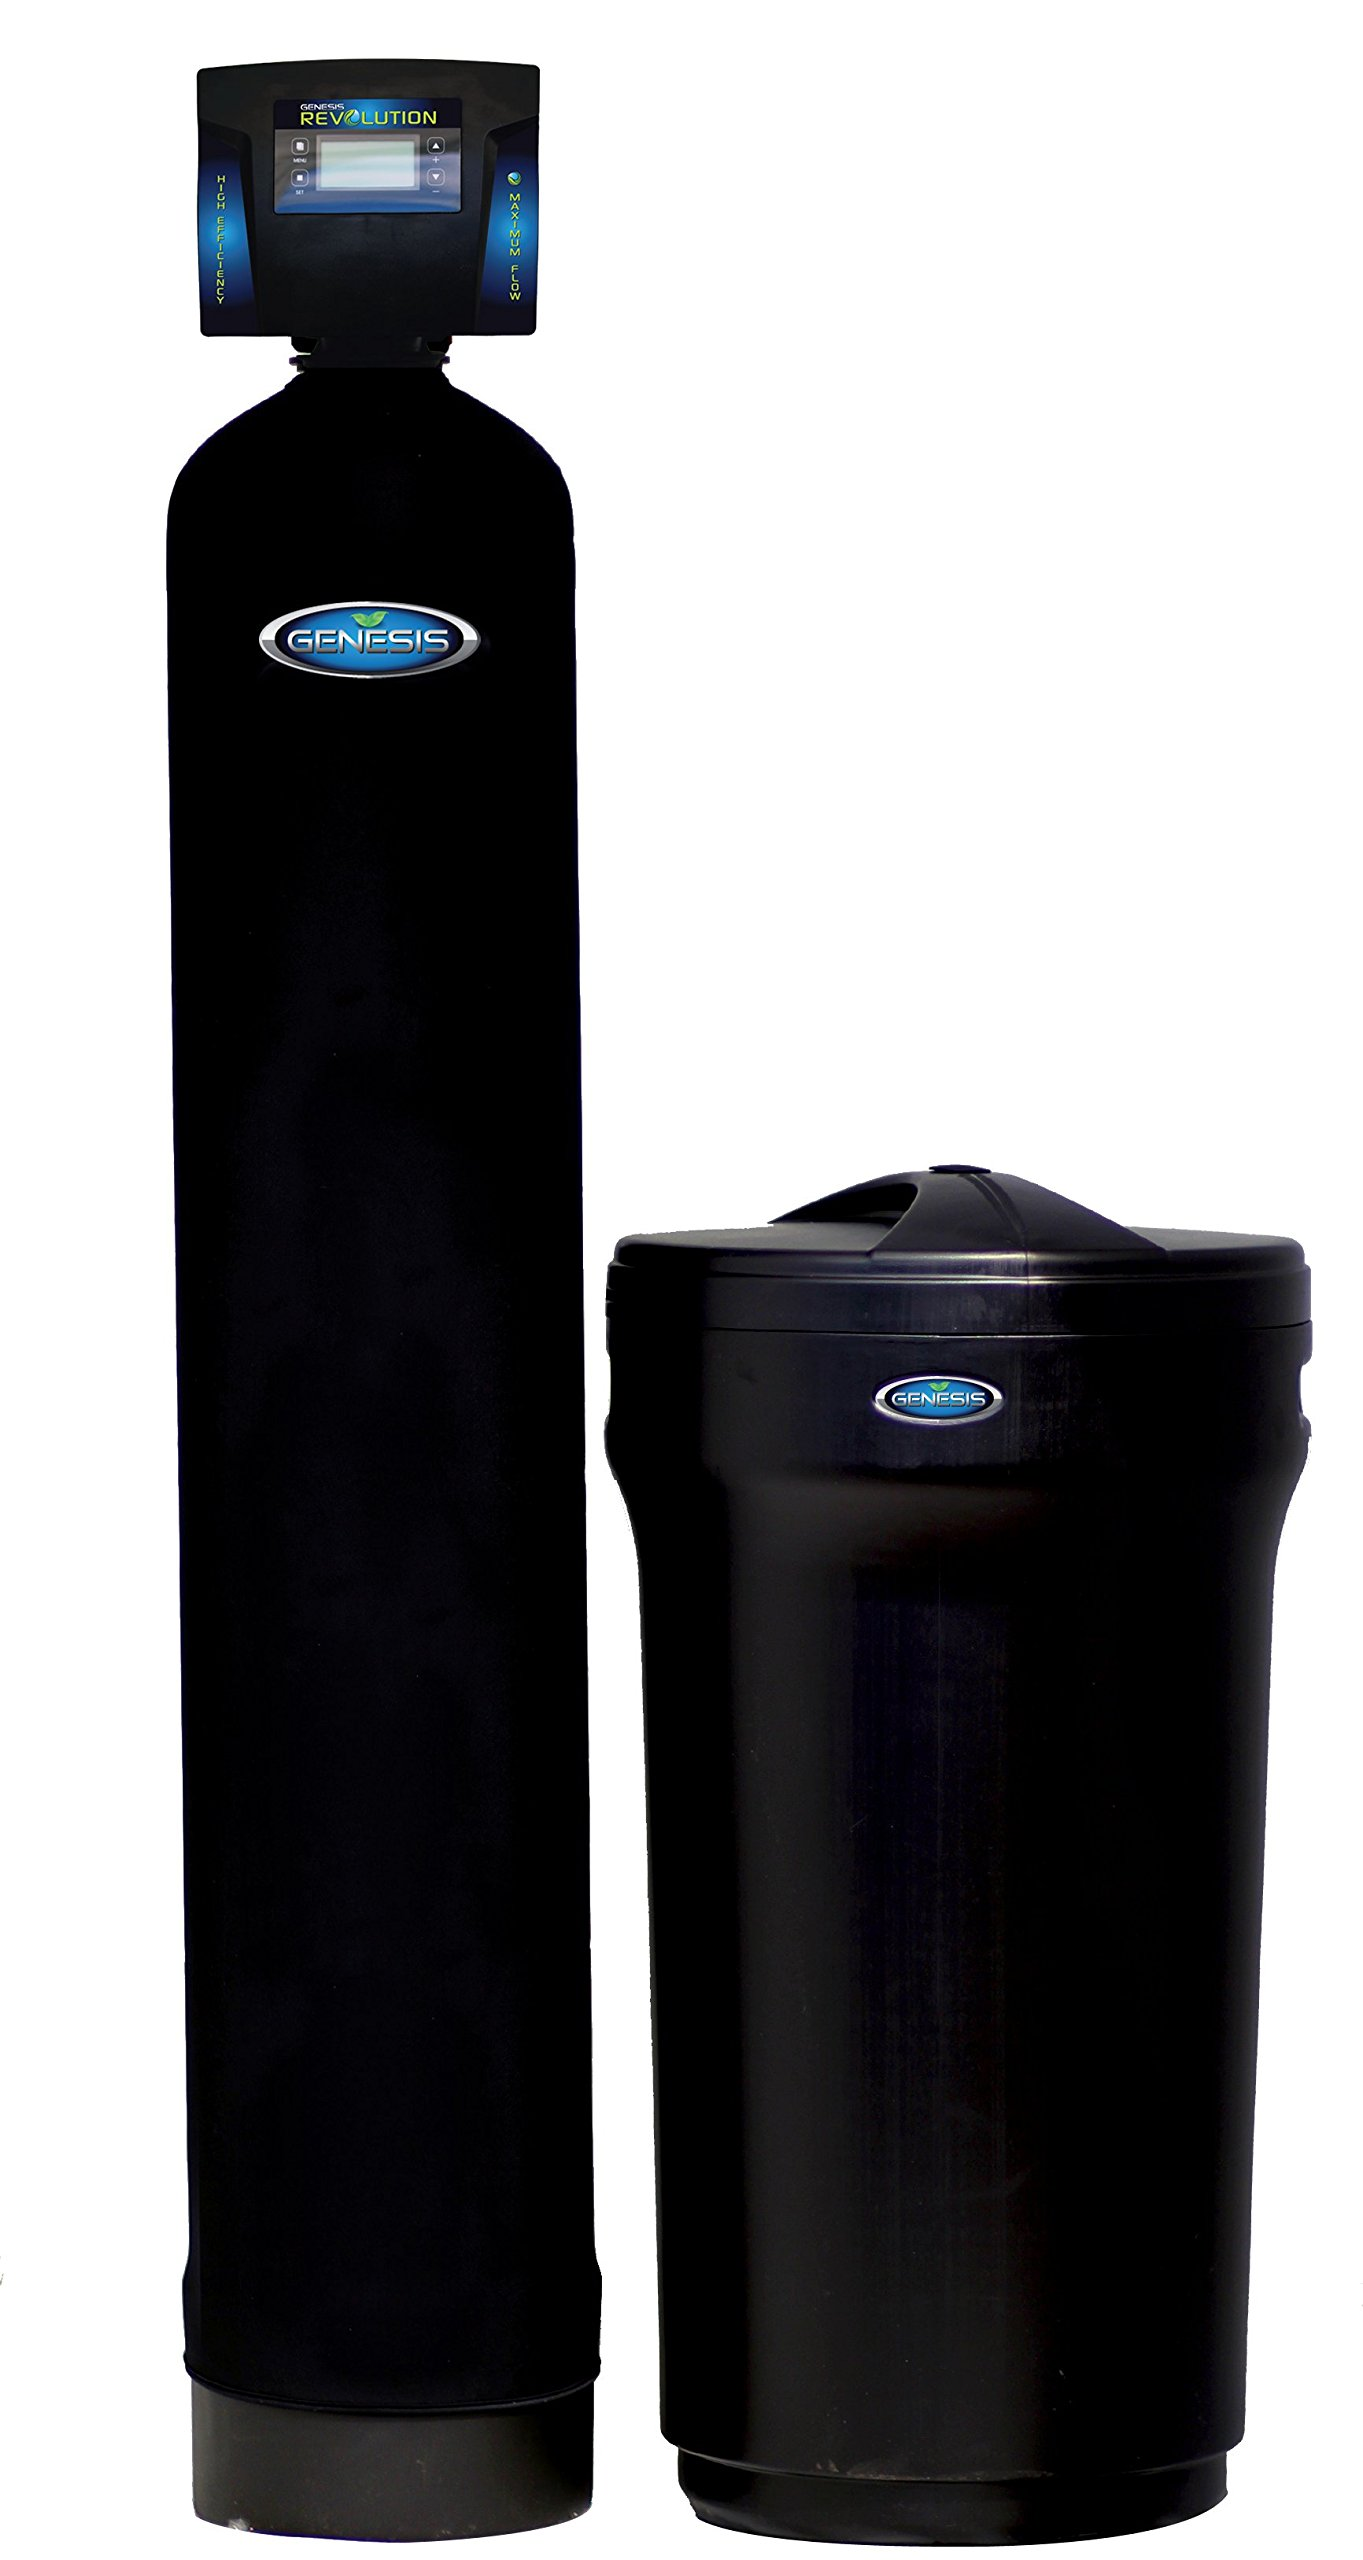 Discount Water Softeners Revolution 64,000 Grain Water Softener – Digital Metered -Maximum Flow Rate, High Efficiency Up Flow